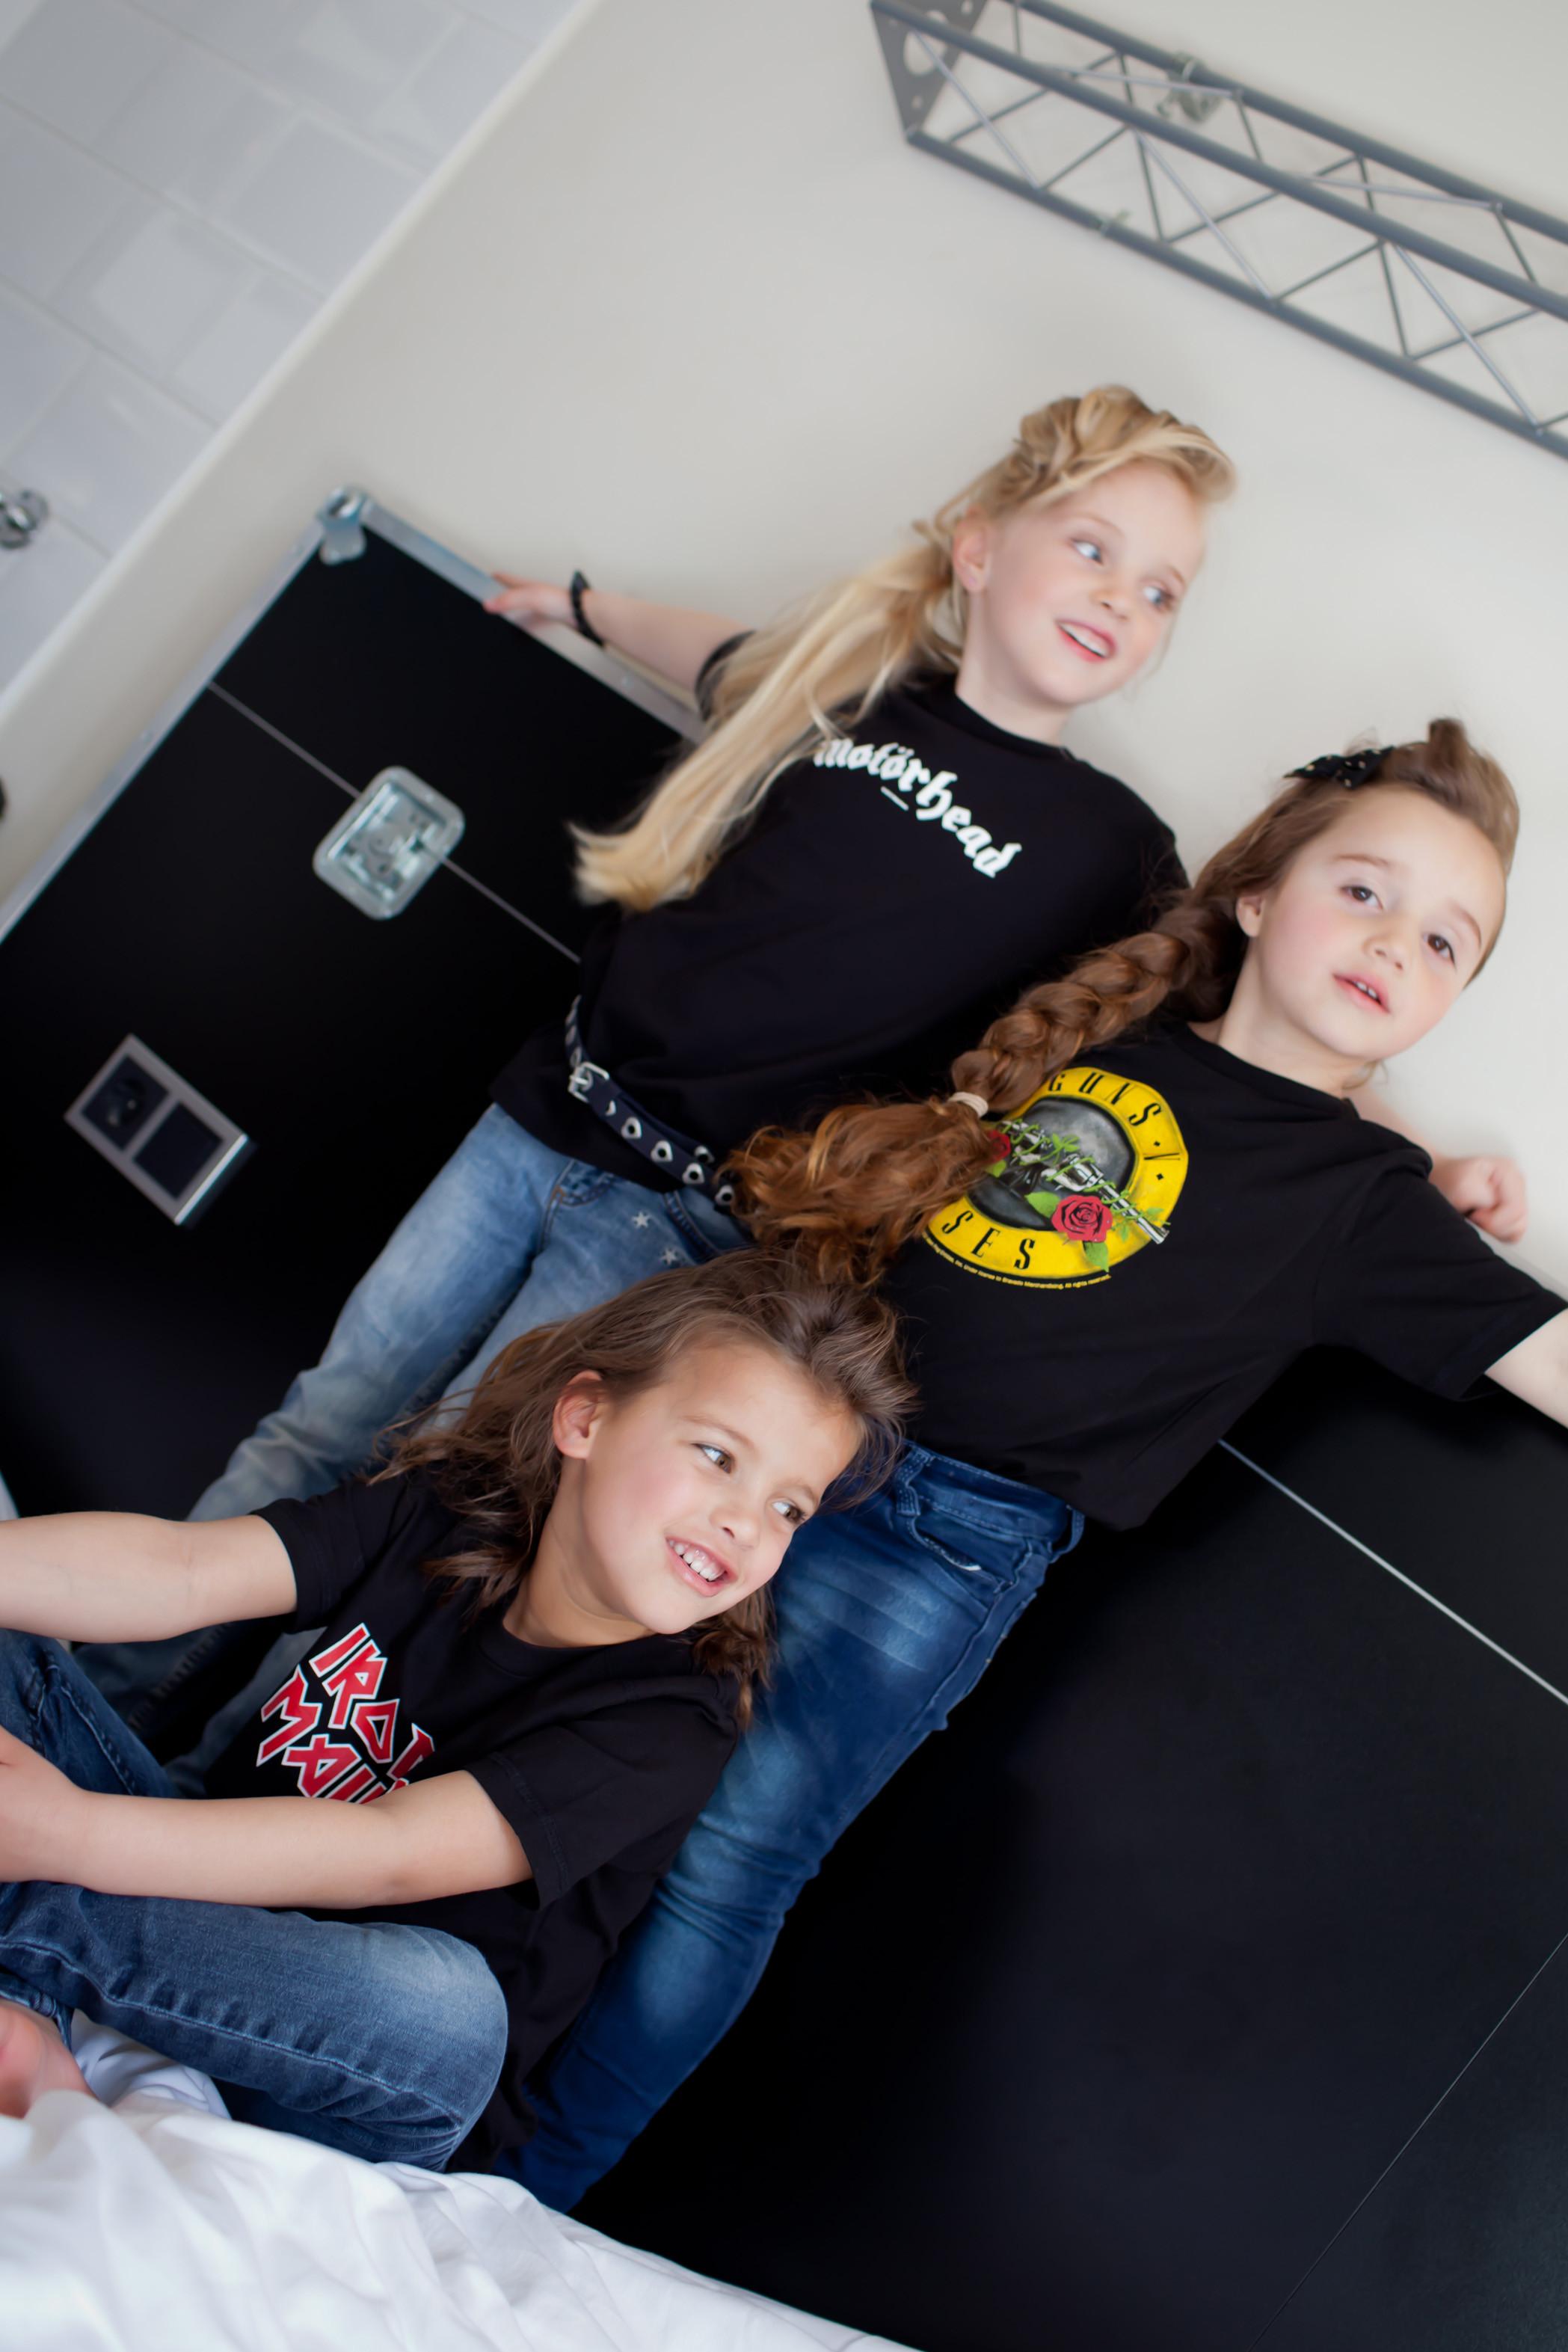 Iron Maiden kids shirts